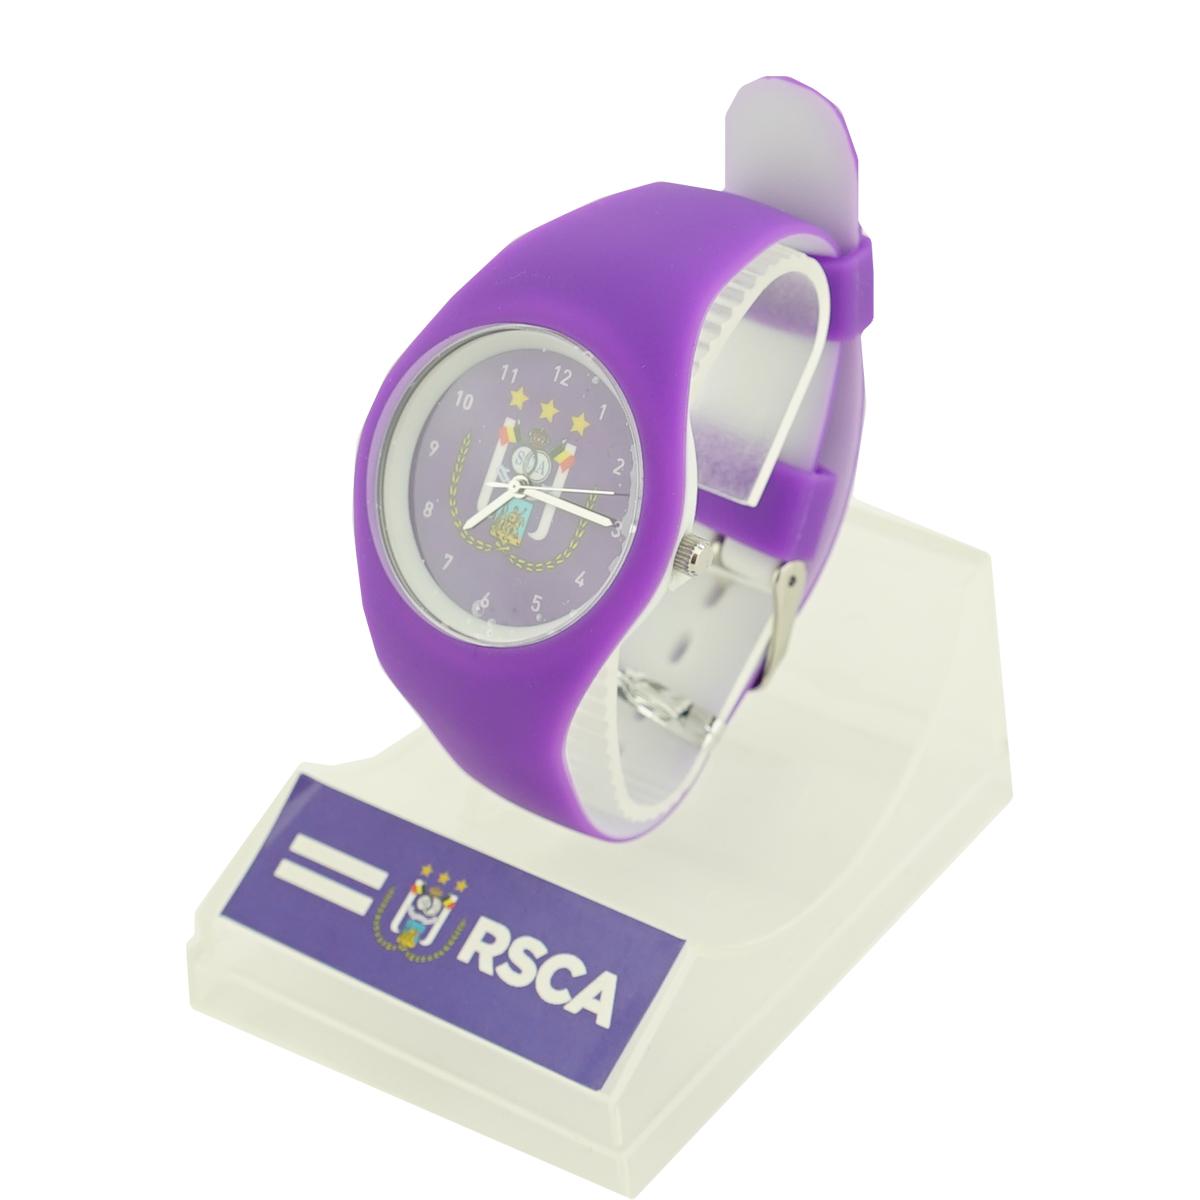 RSCA Silicone Watch